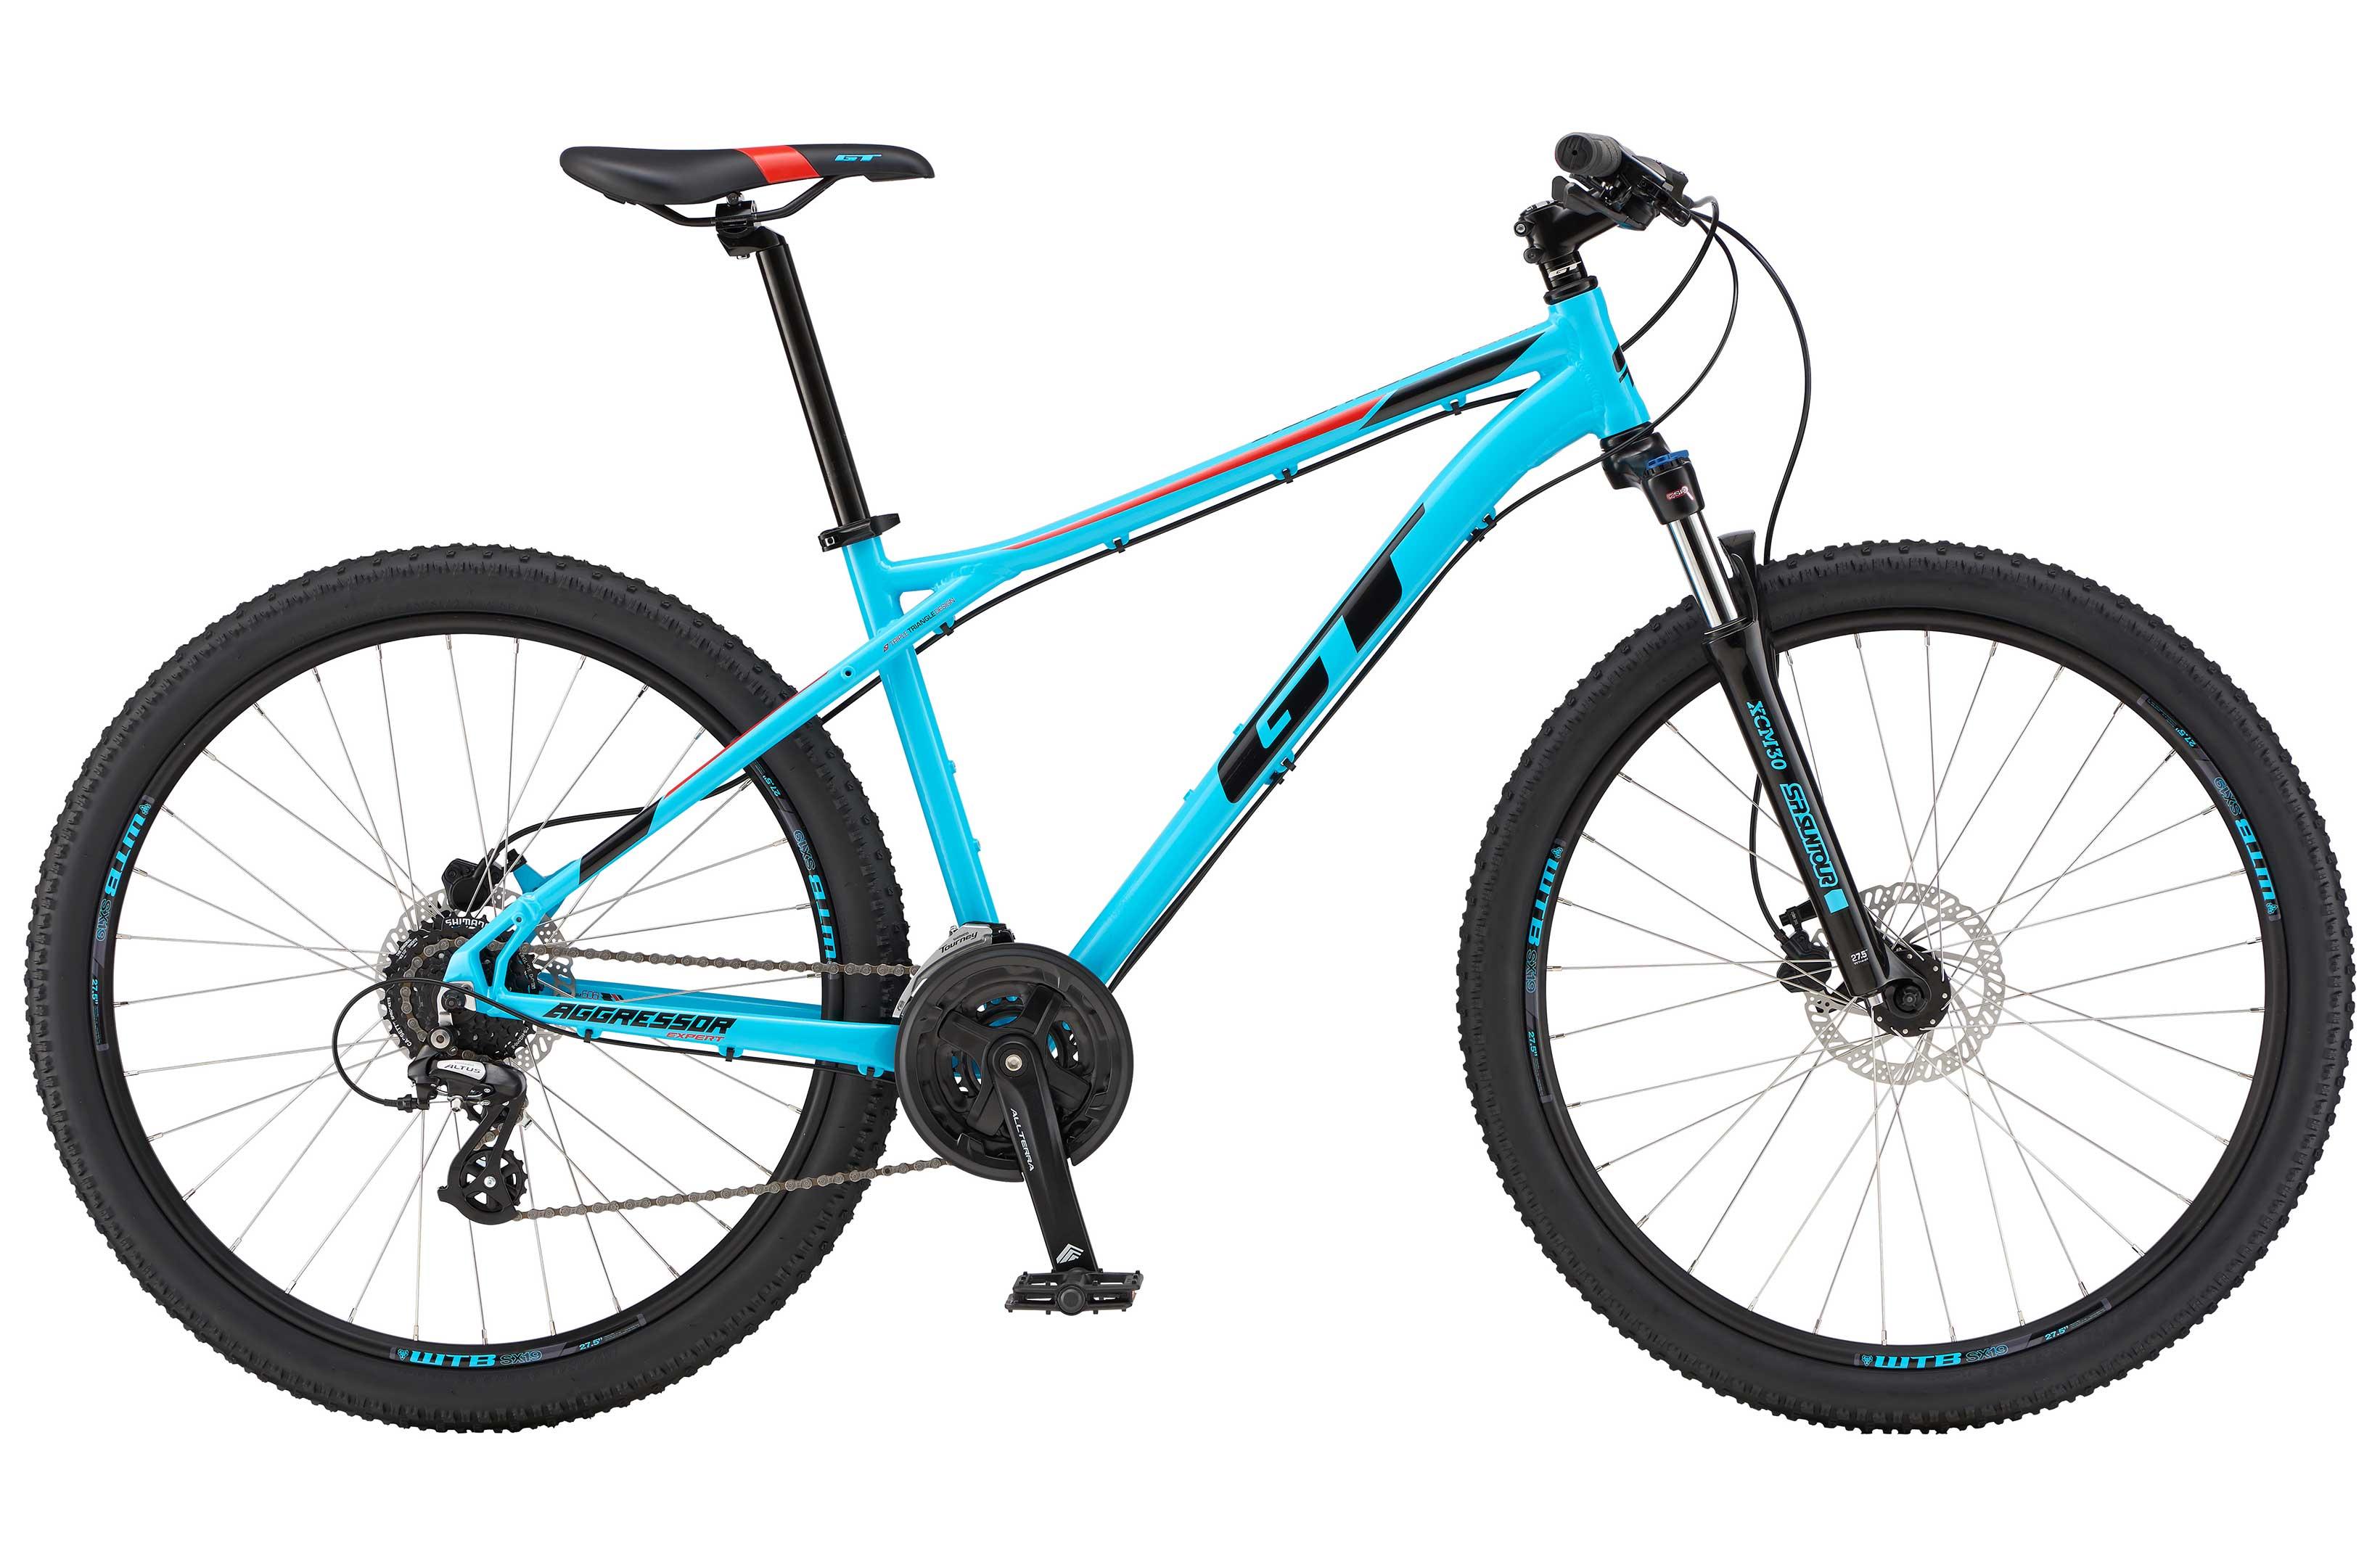 GT Aggressor mountain bike review